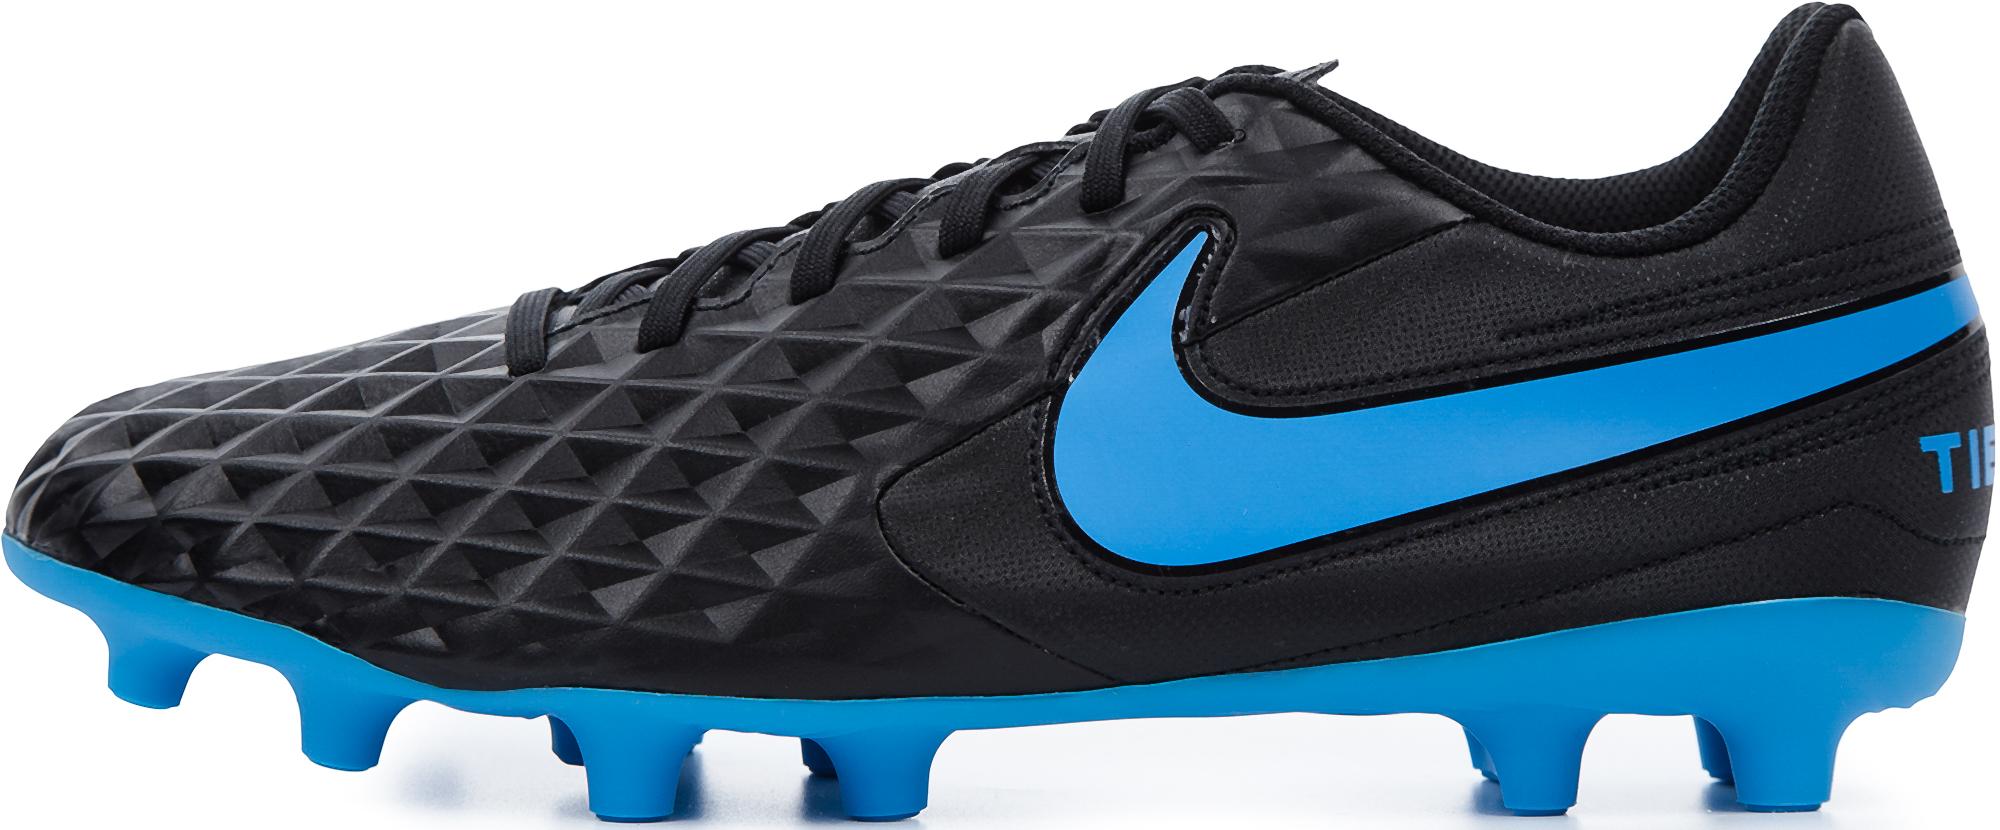 Nike Бутсы мужские Nike Tiempo Legend AG, размер 45 все цены